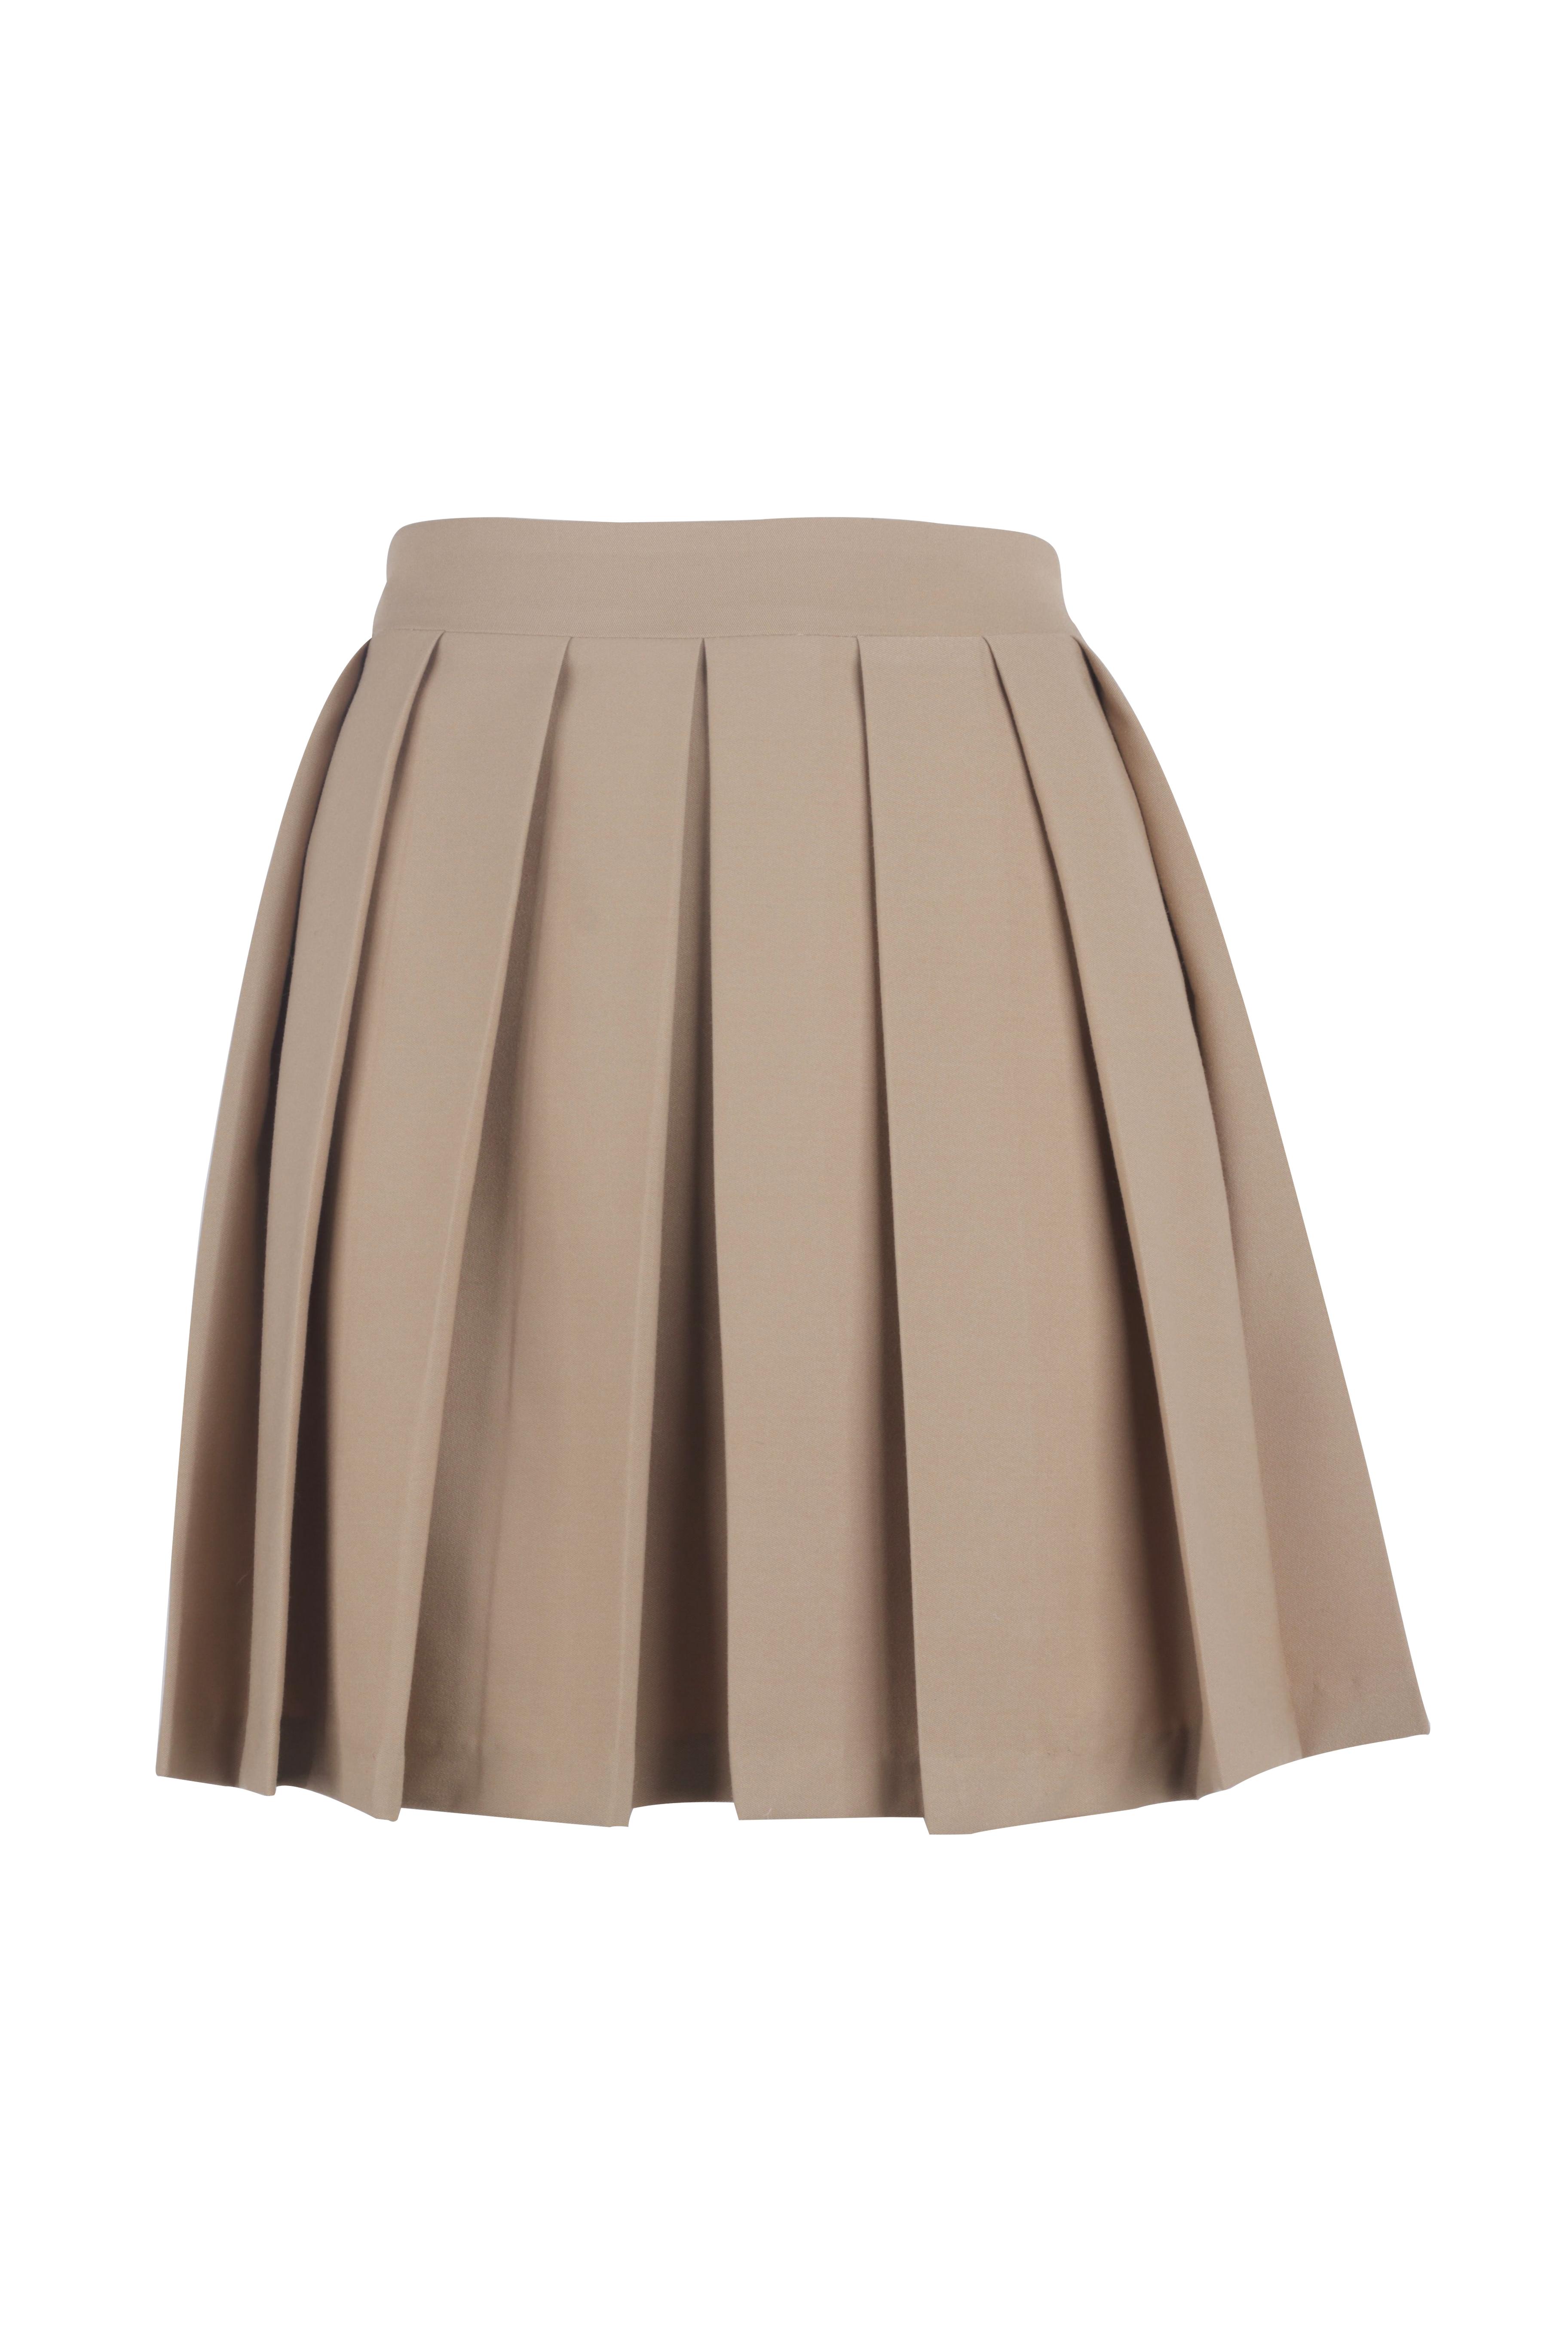 Mandy Skirt